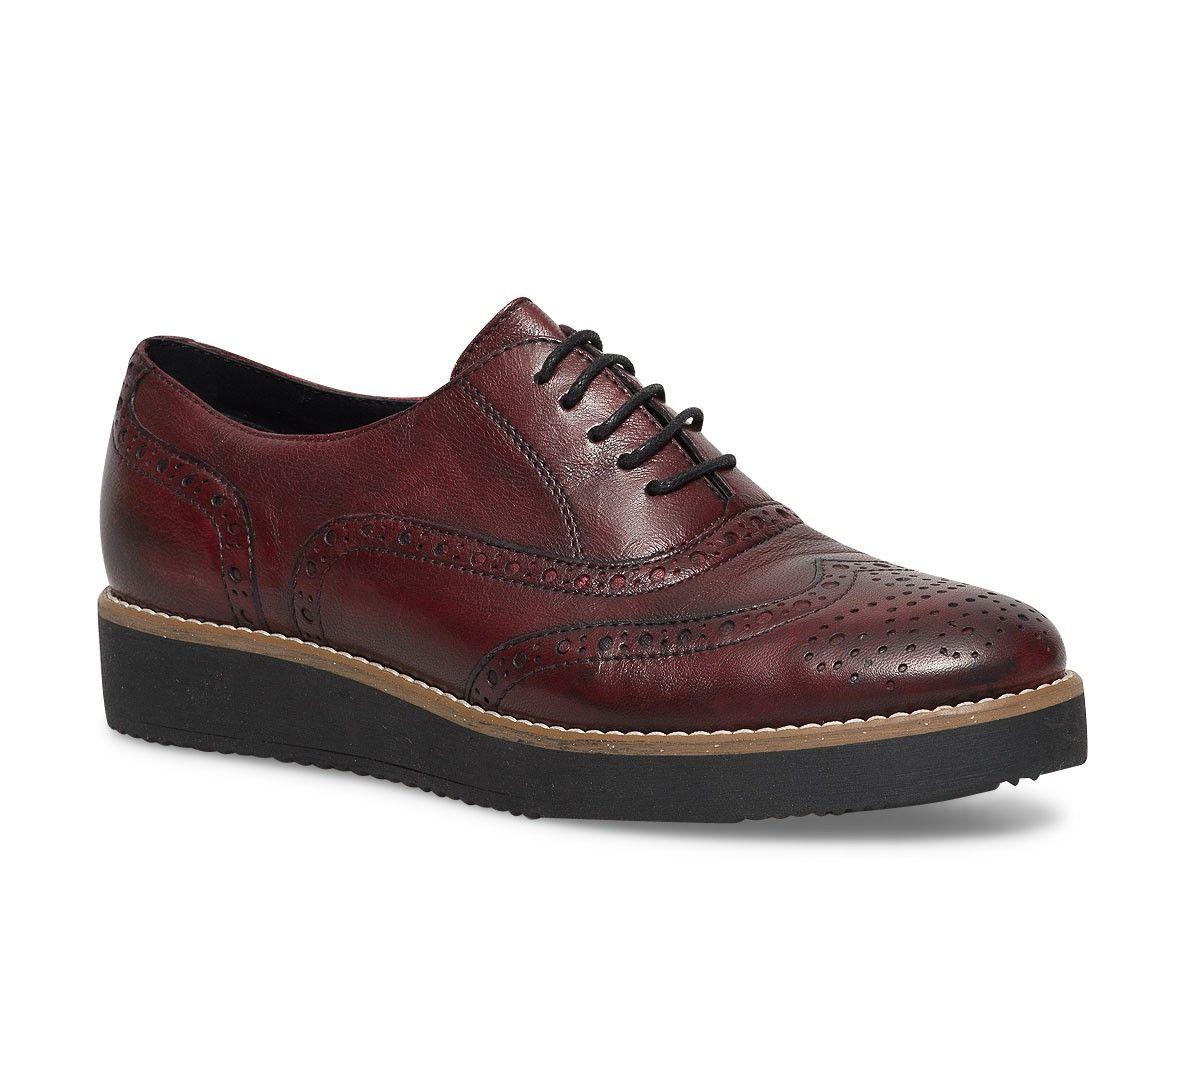 Richelieu cuir rouge - Derbies - Chaussures femme   Piedspieds ... b301d89c5bfe